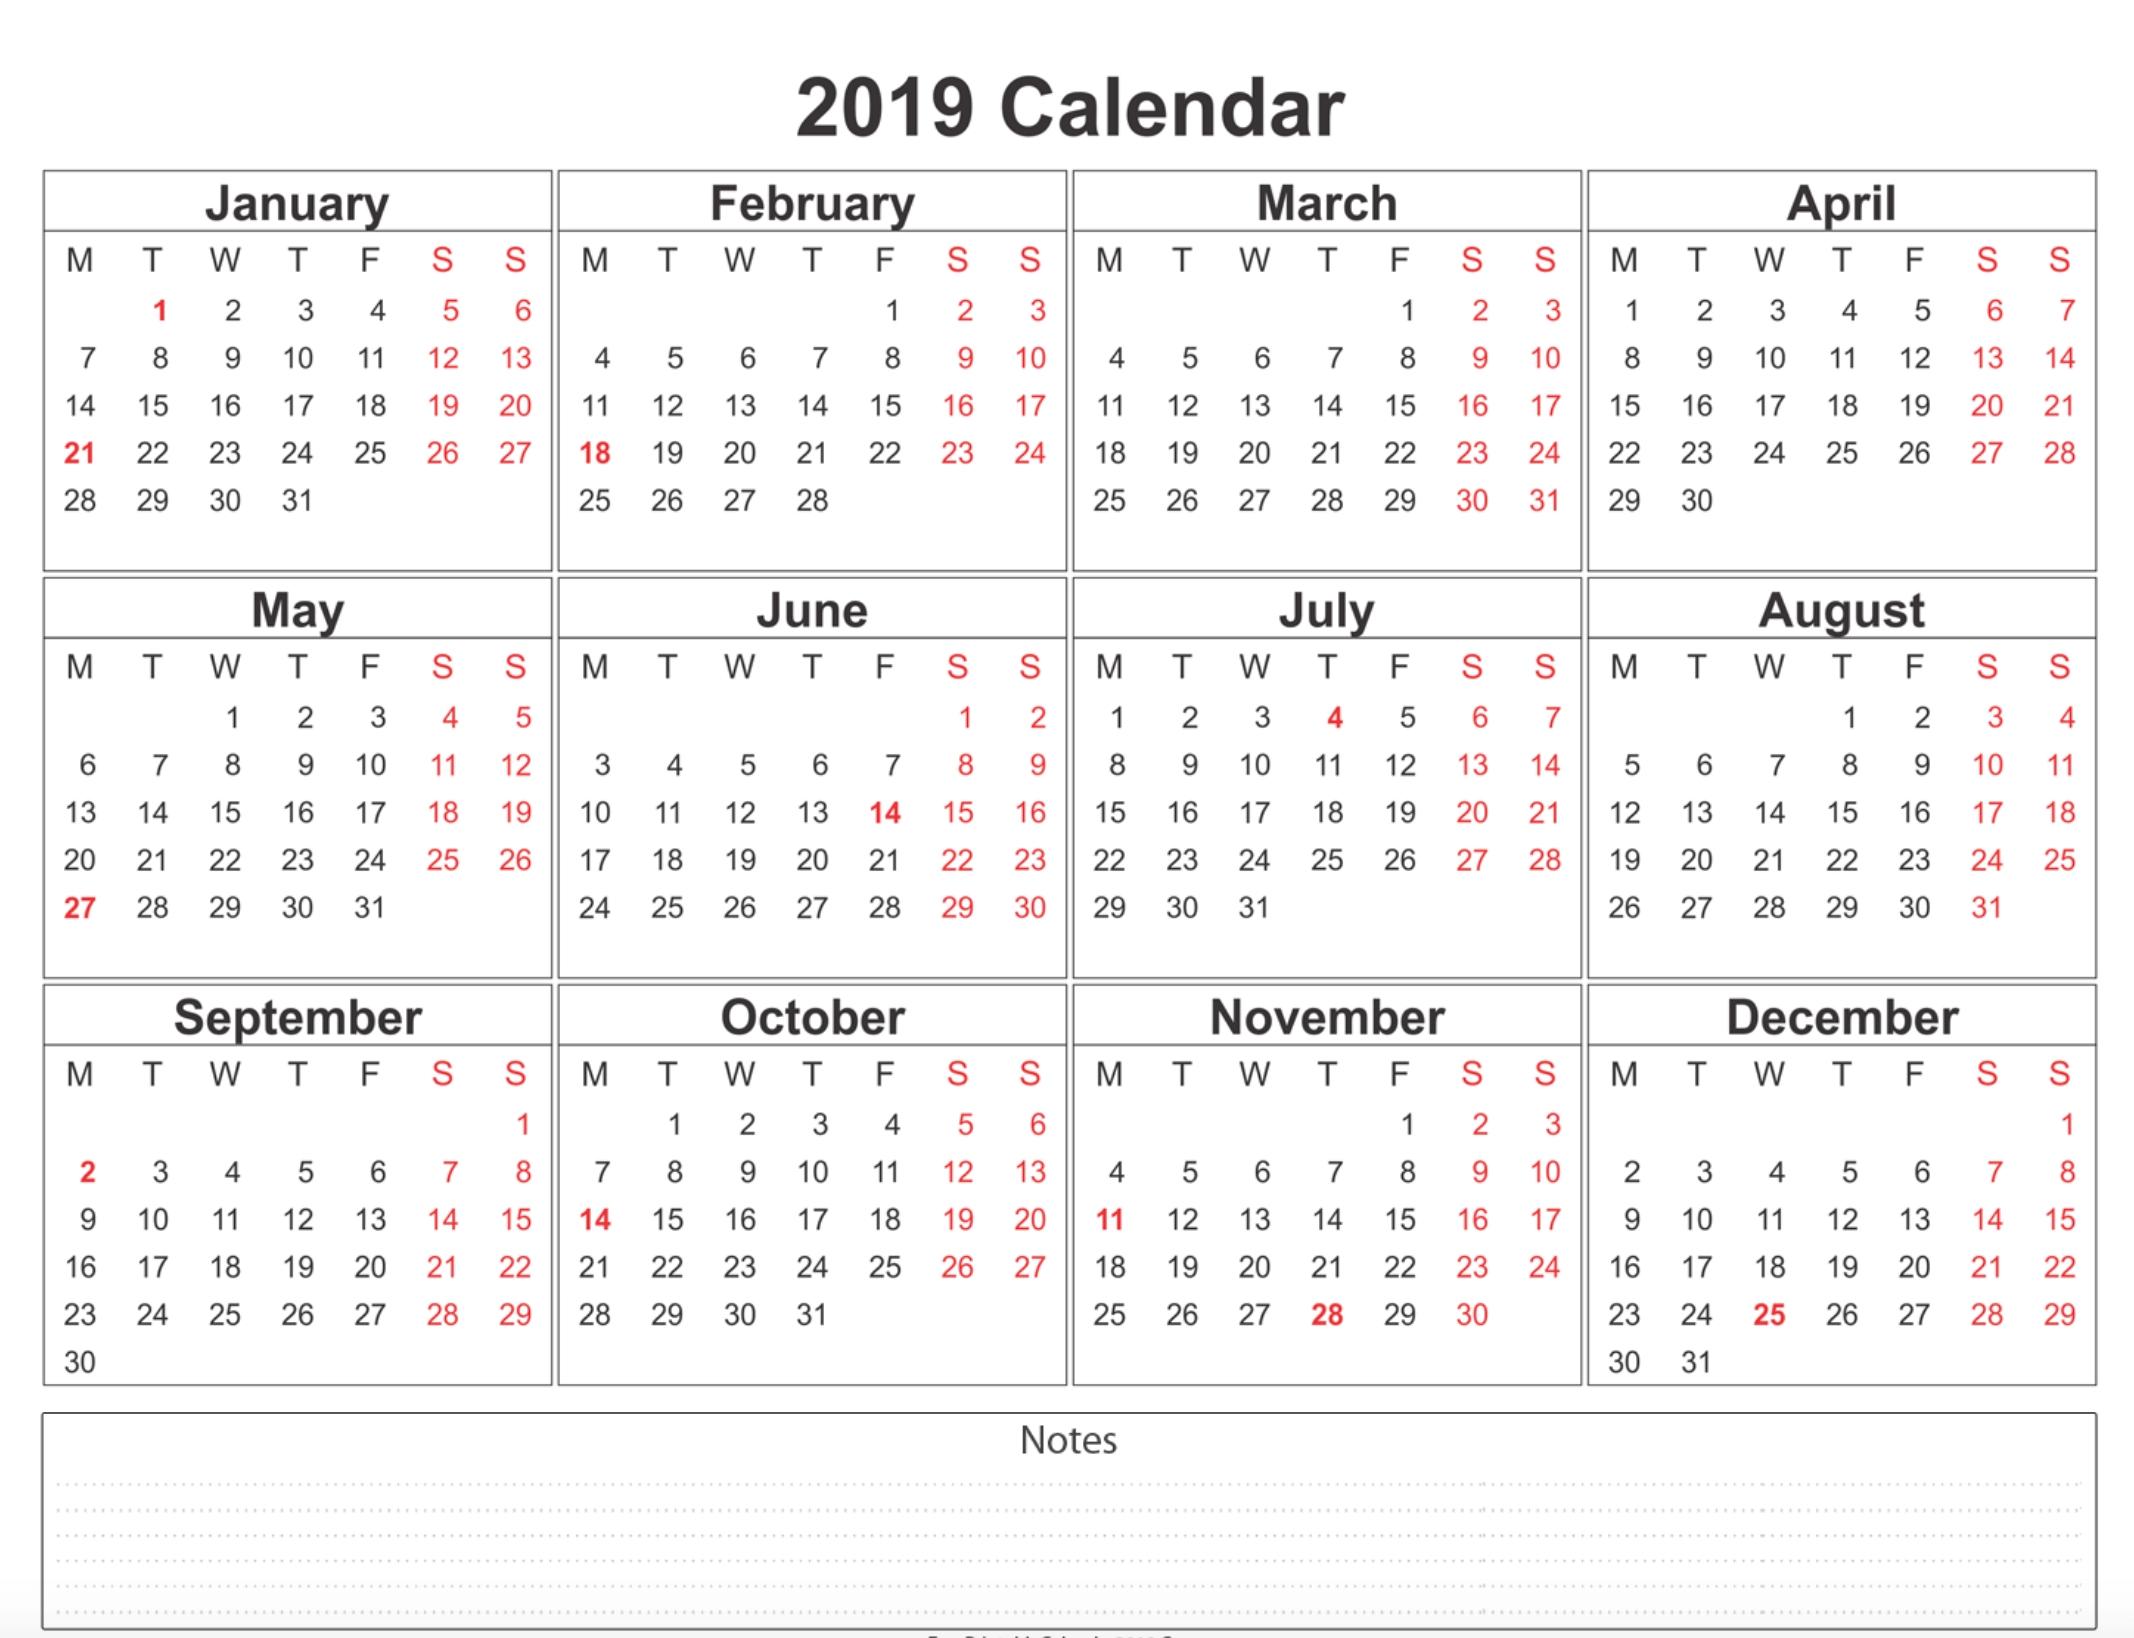 Free Printable Calendar 2019 With Holidays | Blank 12 Month Calendar Calendar 2019 12